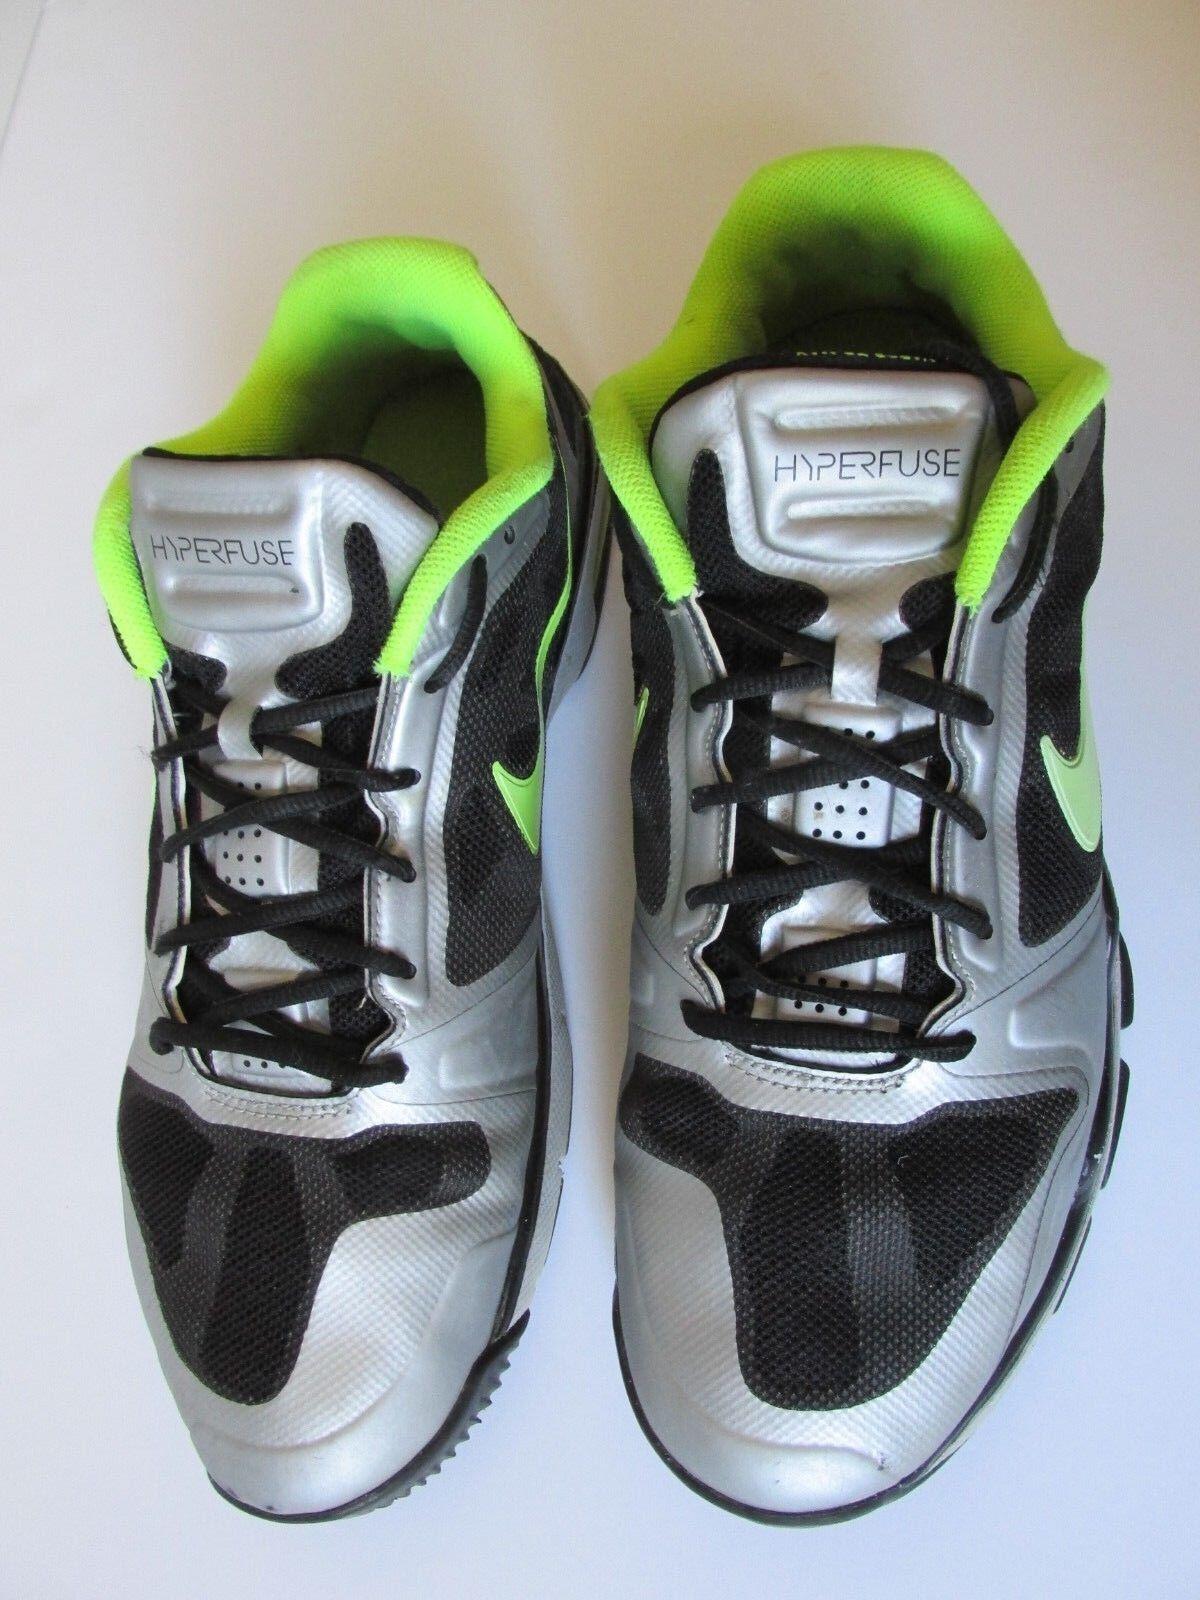 42dad3d42d266 ... Nike Hyperfuse Vapor TR TR TR Max Black Volt Metallic Silver shoes  Men s US14M 4d0ea9 ...